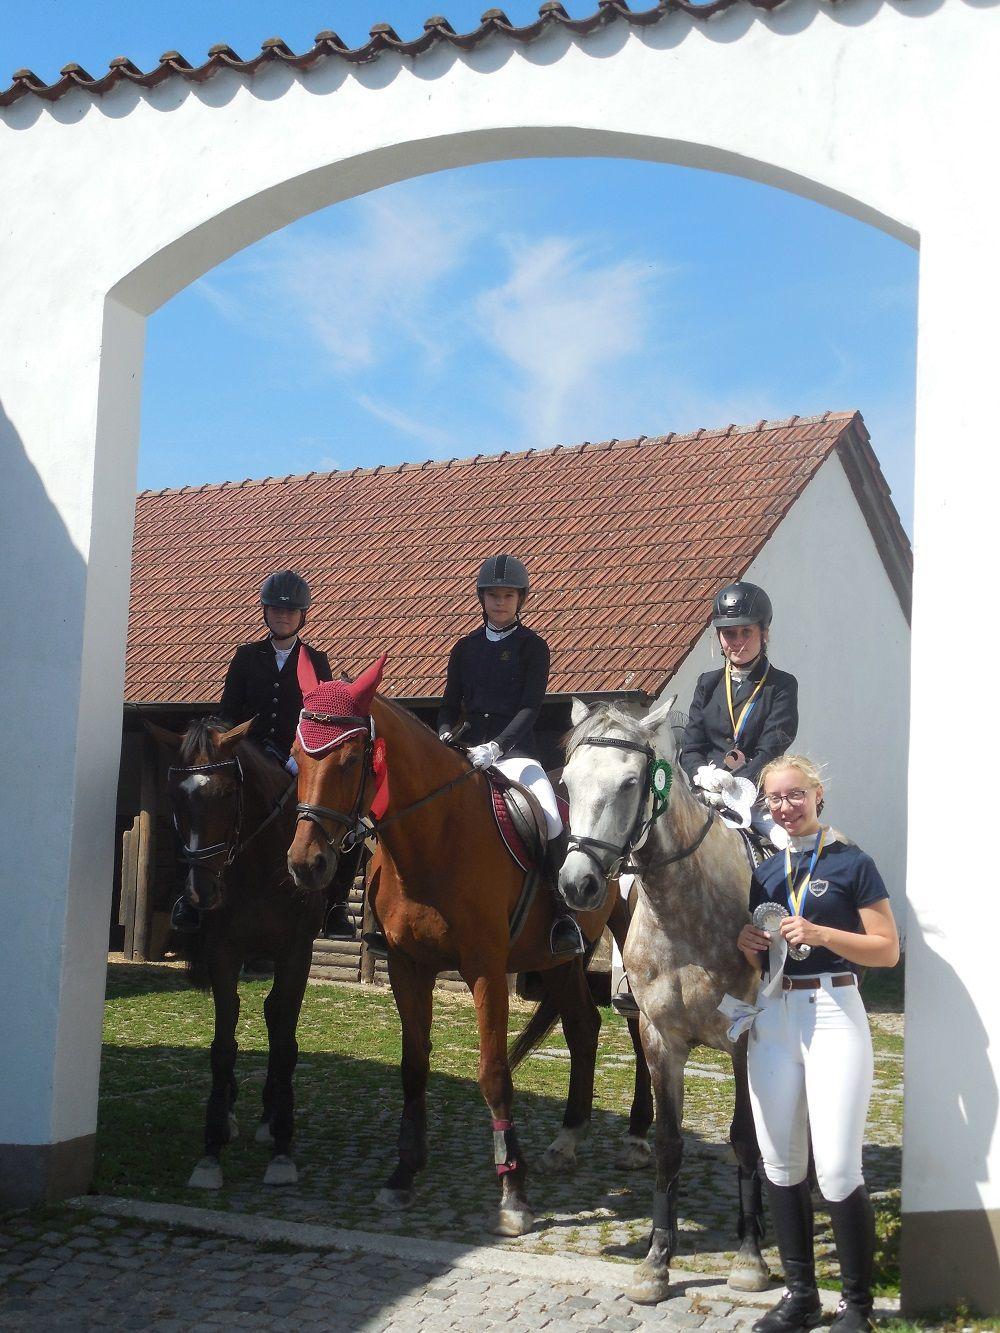 Garnzell Leonie Pucknus mit Royal Rock 6. Platz, Marie Kadura mit Lassey 4. Platz, Mona Staudacher mit Shalamar Tara 3. Platz, Lea Neubauer 2. Platz